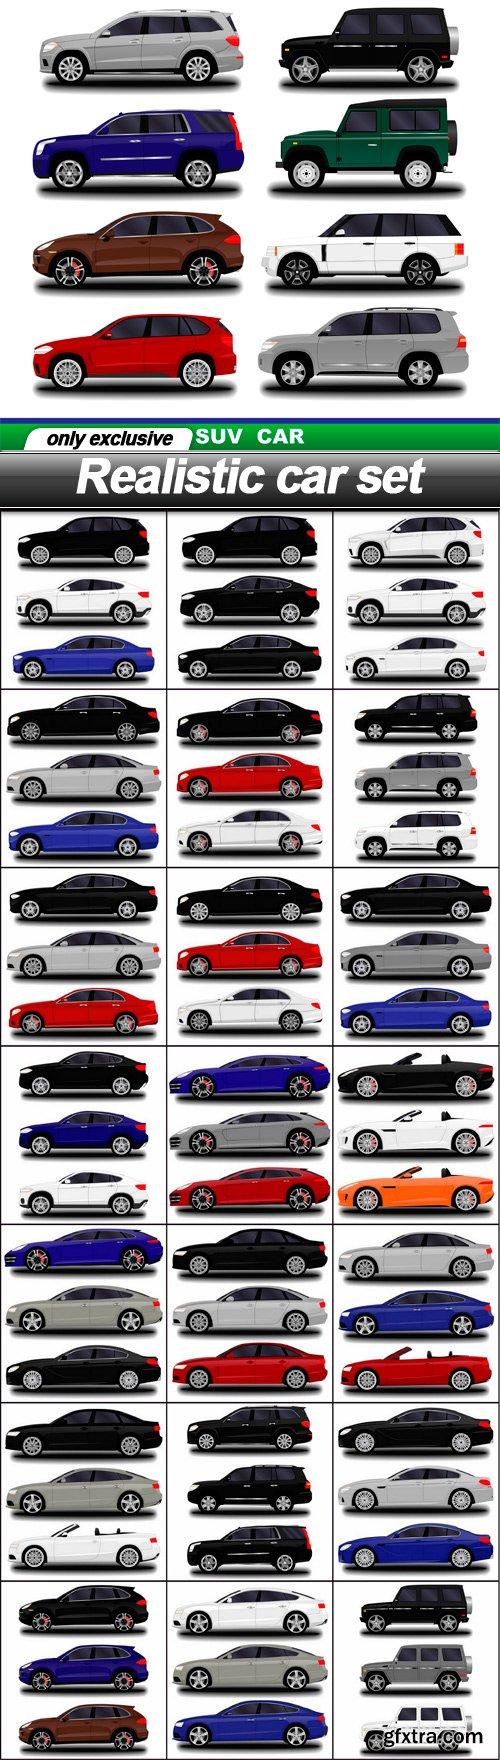 Realistic car set - 22 EPS